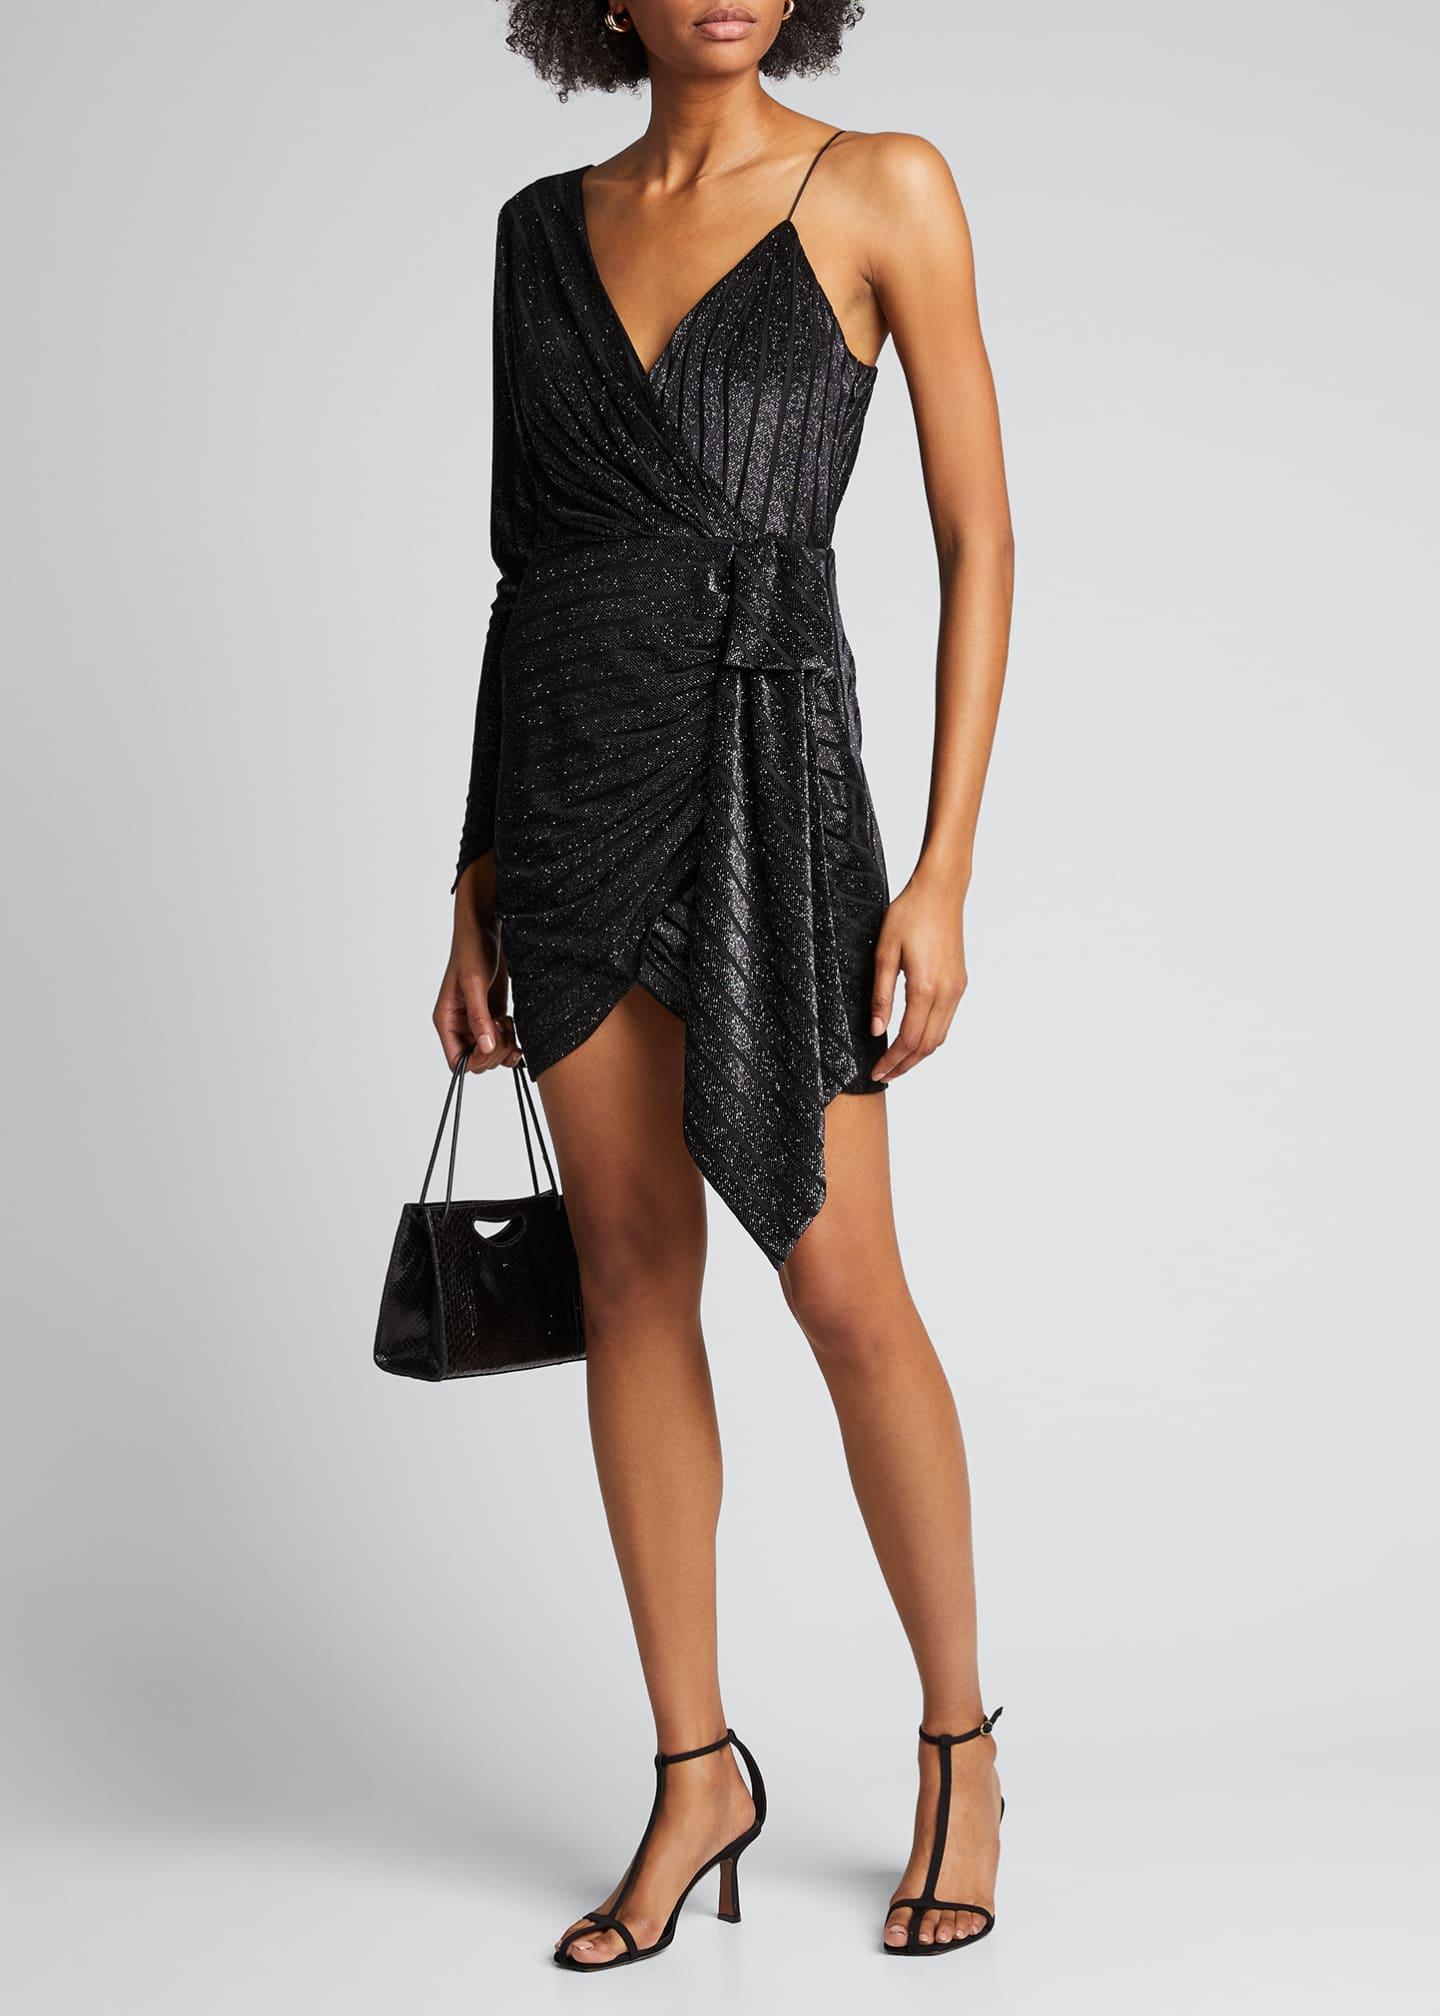 Retrofete Carole Metallic One-Shoulder Cocktail Dress